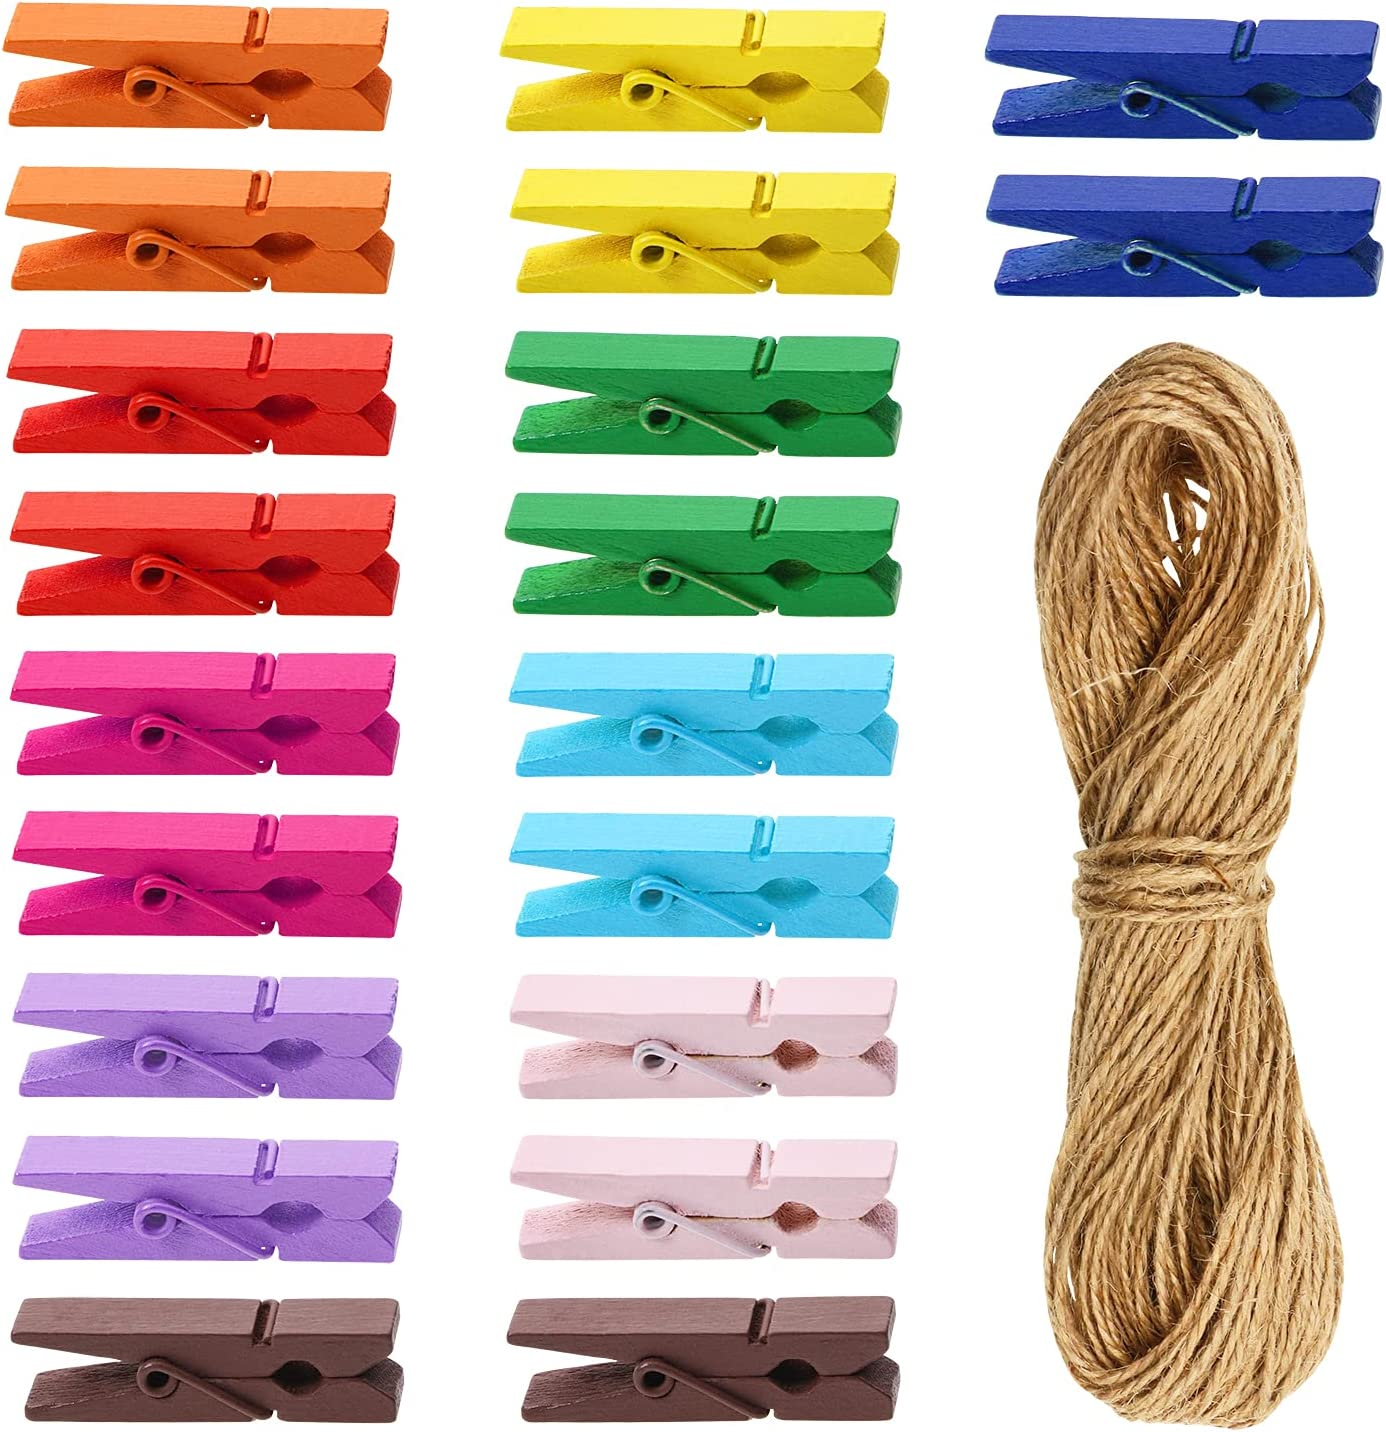 Penta Angel 120PCS Our Max 65% OFF shop most popular Mini Bright Spring Wooden Colored Clo Natural